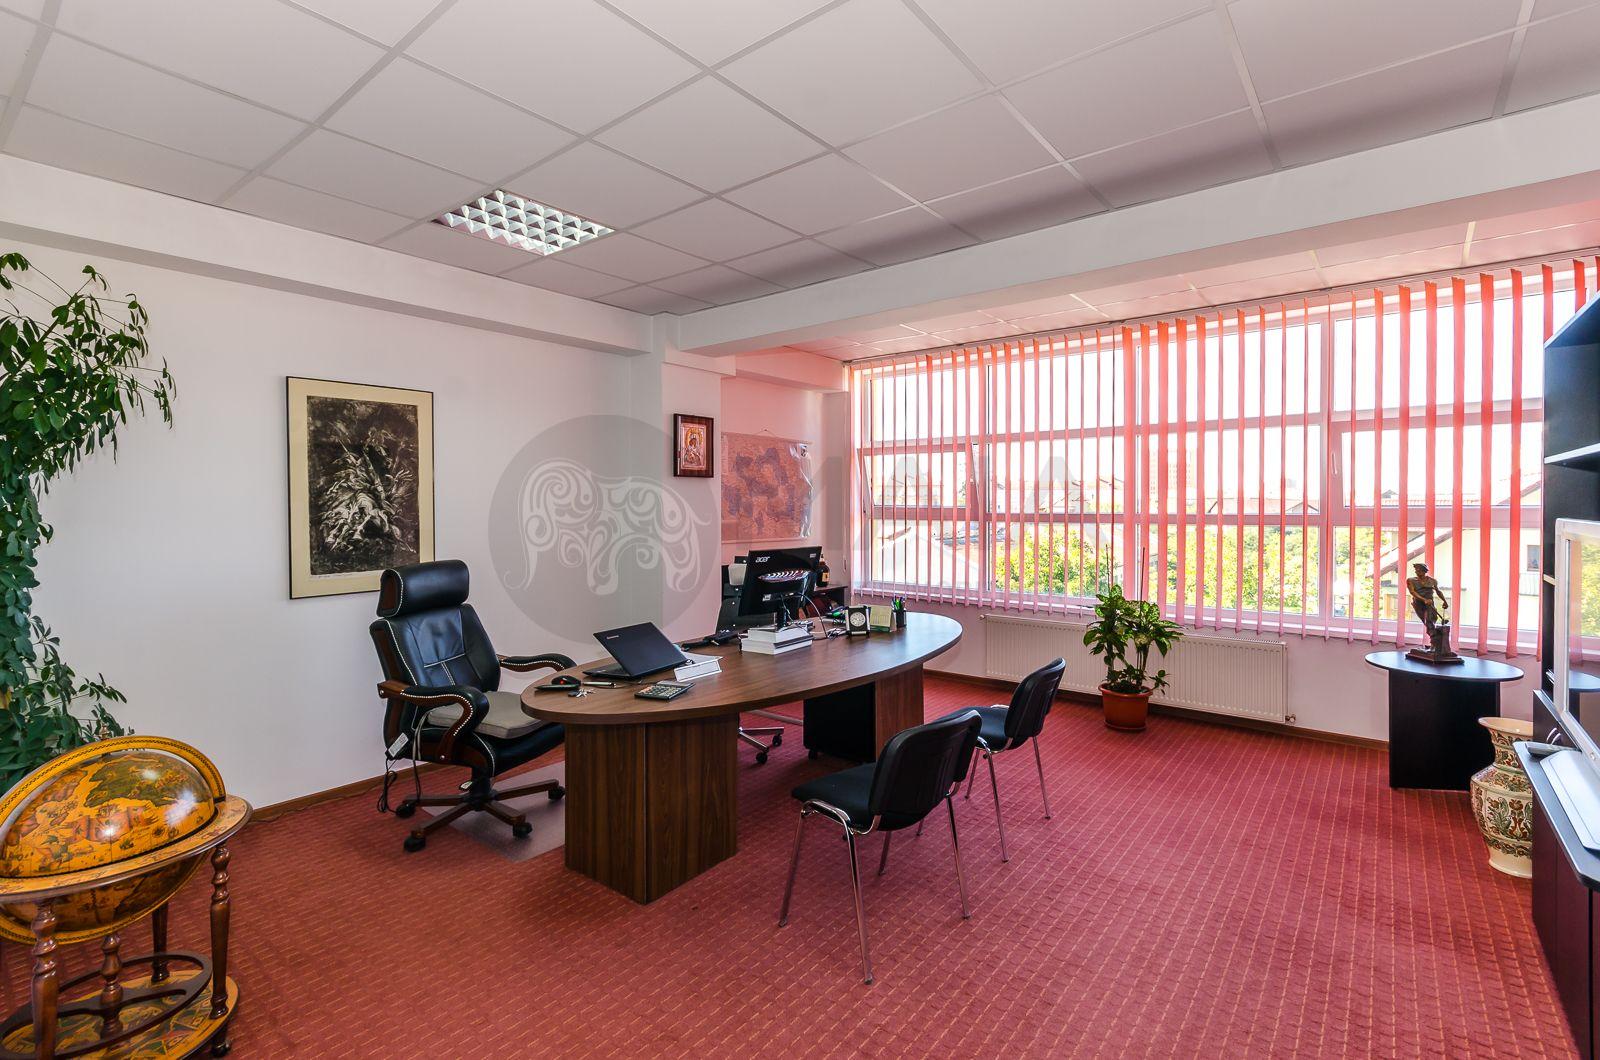 Spatiu birouri , 3 camere, 2 bai, 127mp, constructie 2009, zona centrala